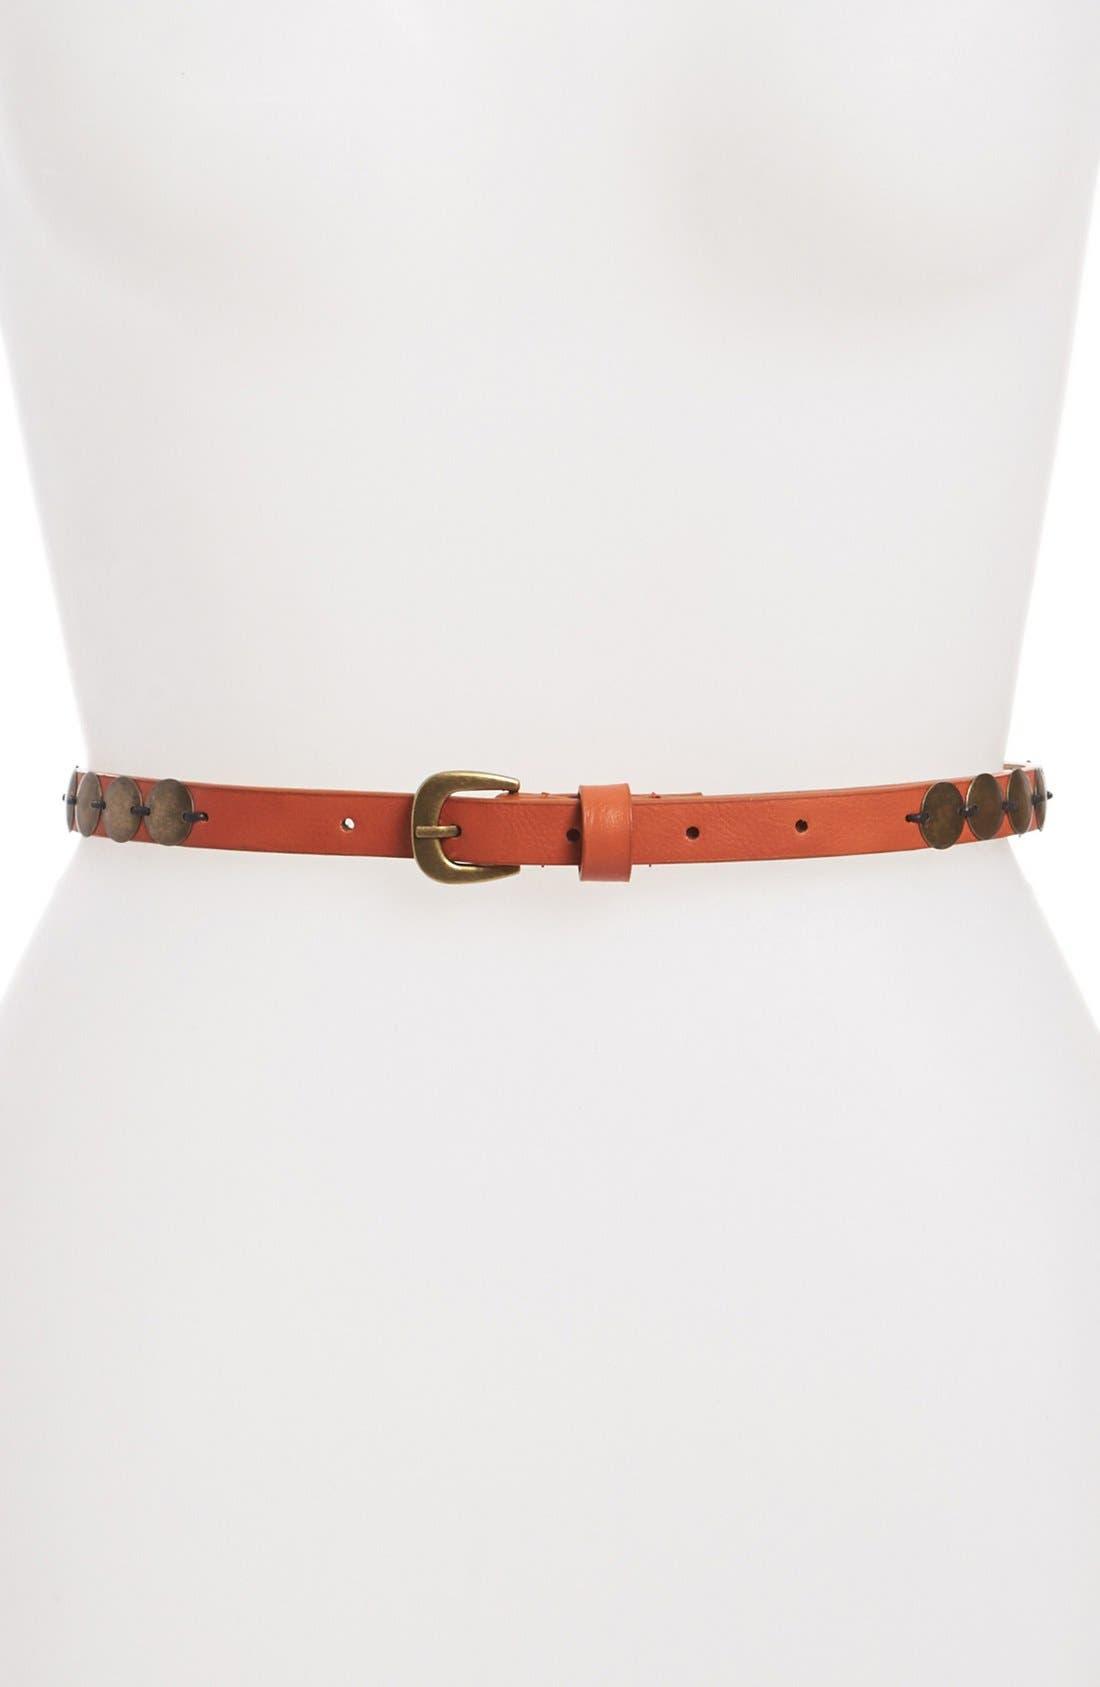 Main Image - Belgo Lux Studded Skinny  Belt